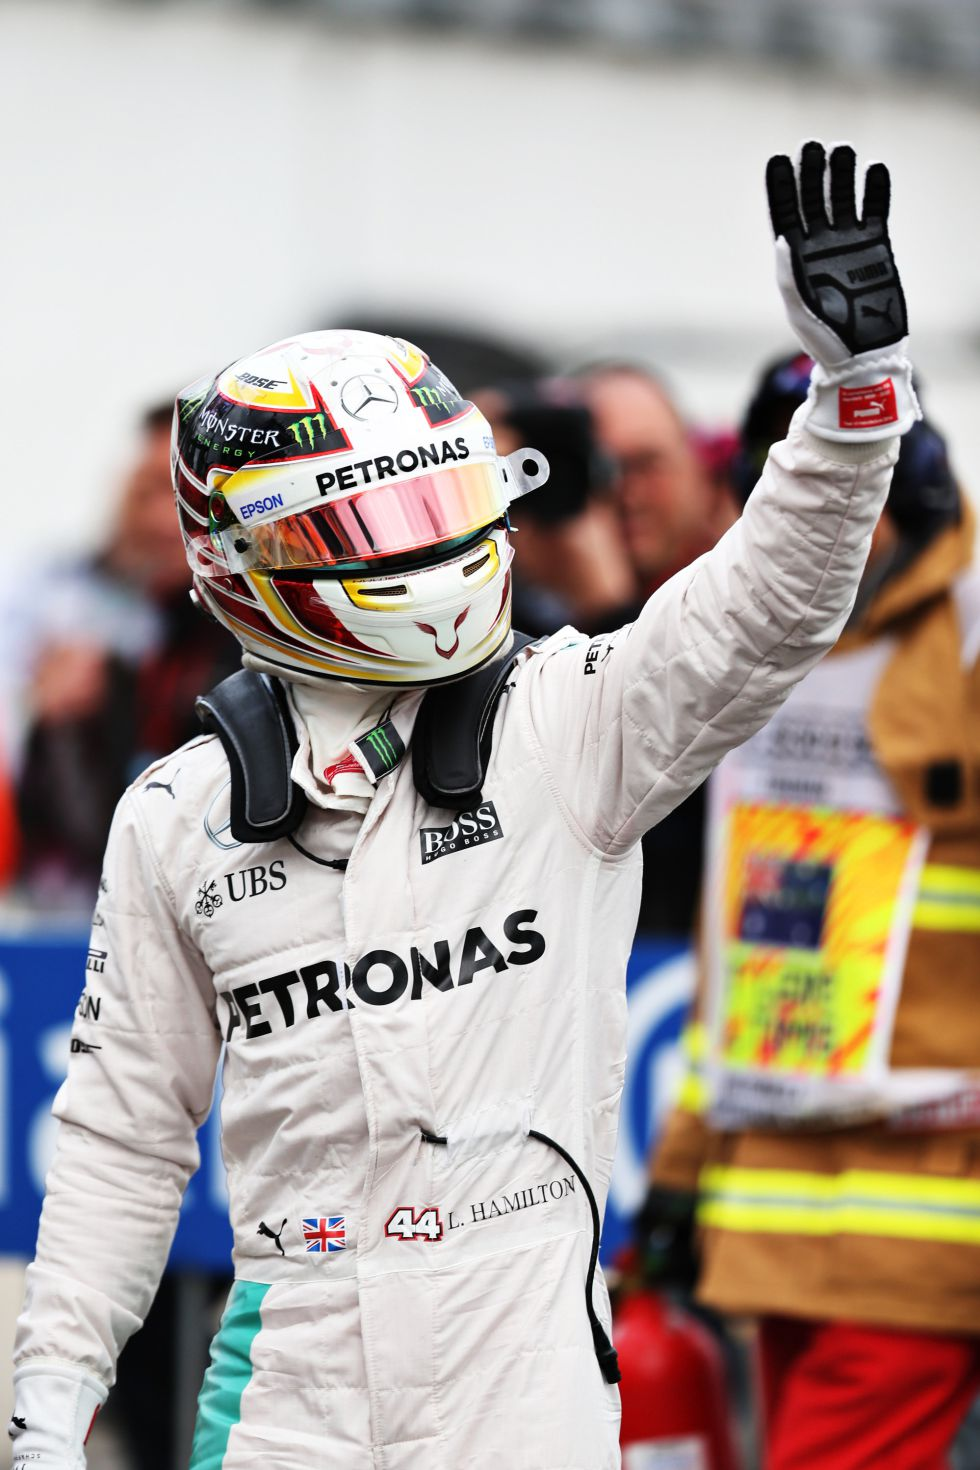 F1: Primera pole para Hamilton; Sainz saldrá 7º y Alonso, 12º